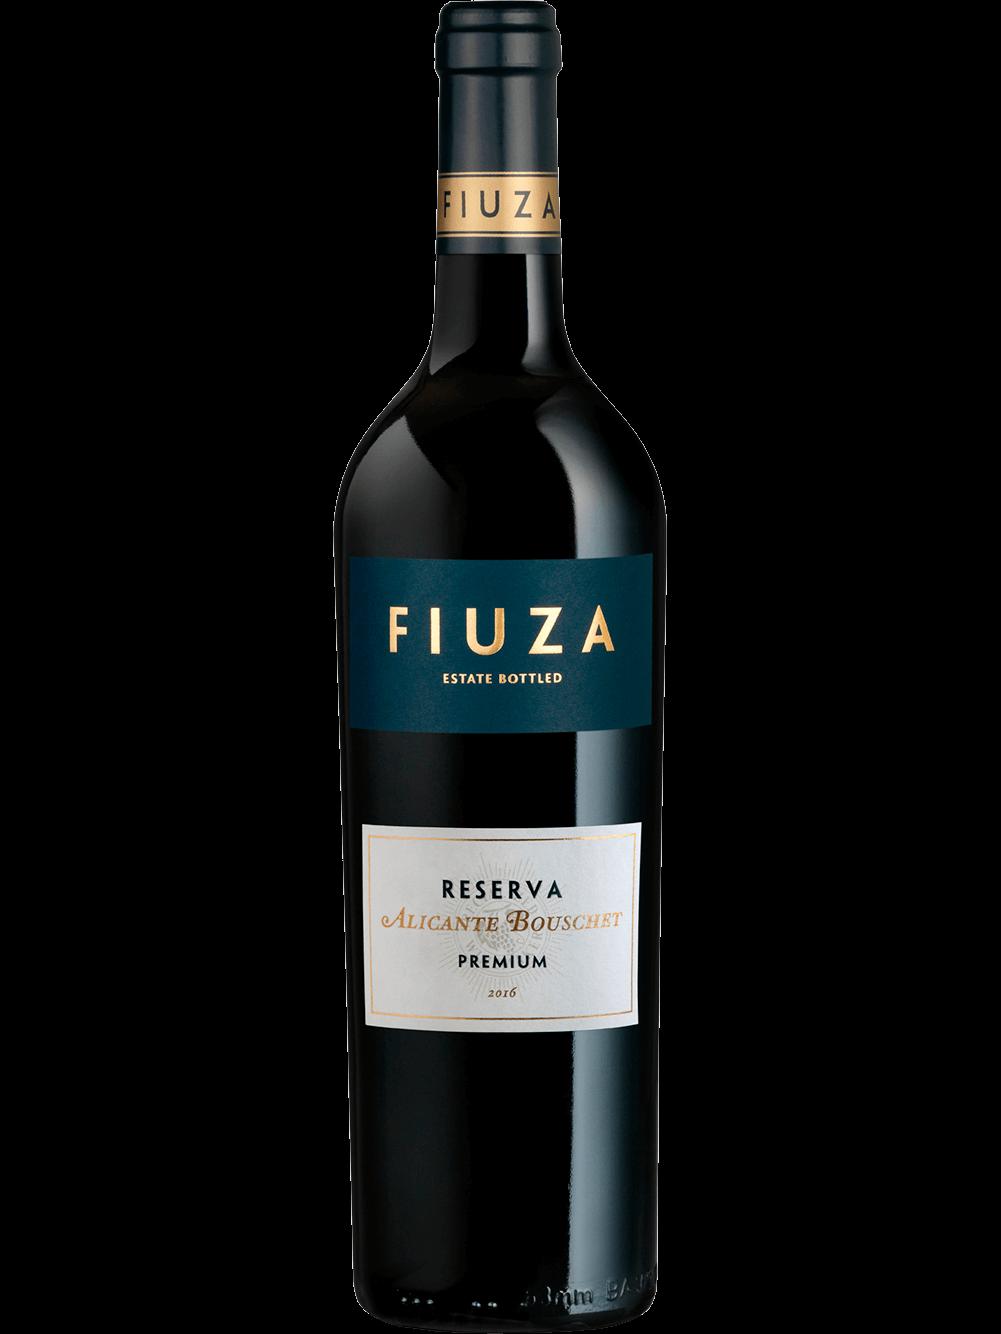 Fiuza Reserva Premium Tinto 2016